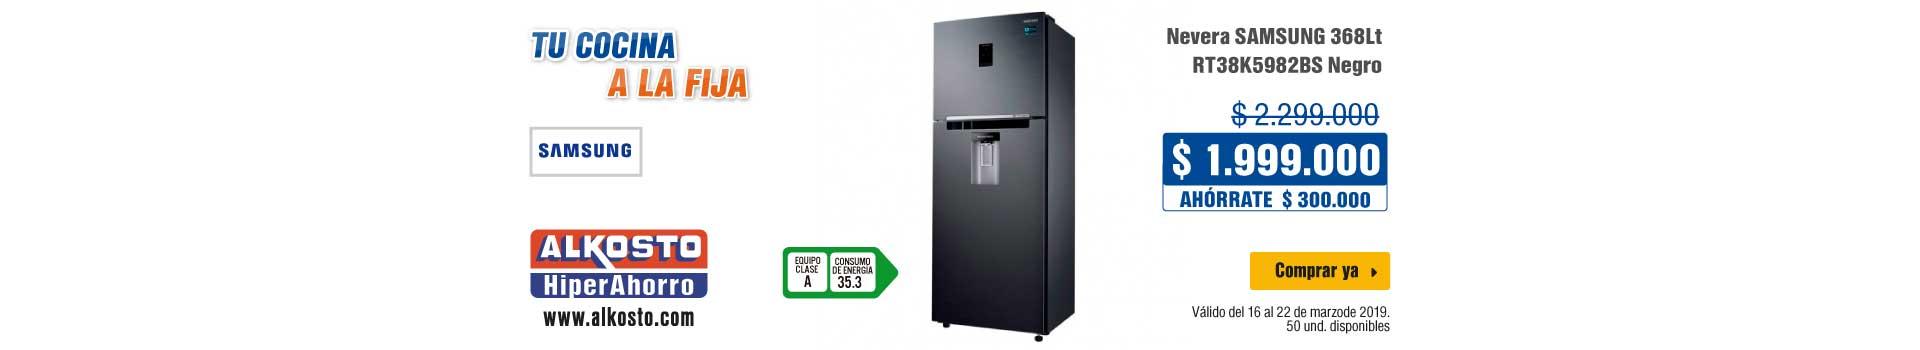 AK-KT-mayores-2-ELECT-BCAT-refrigeracion-samsung-160319